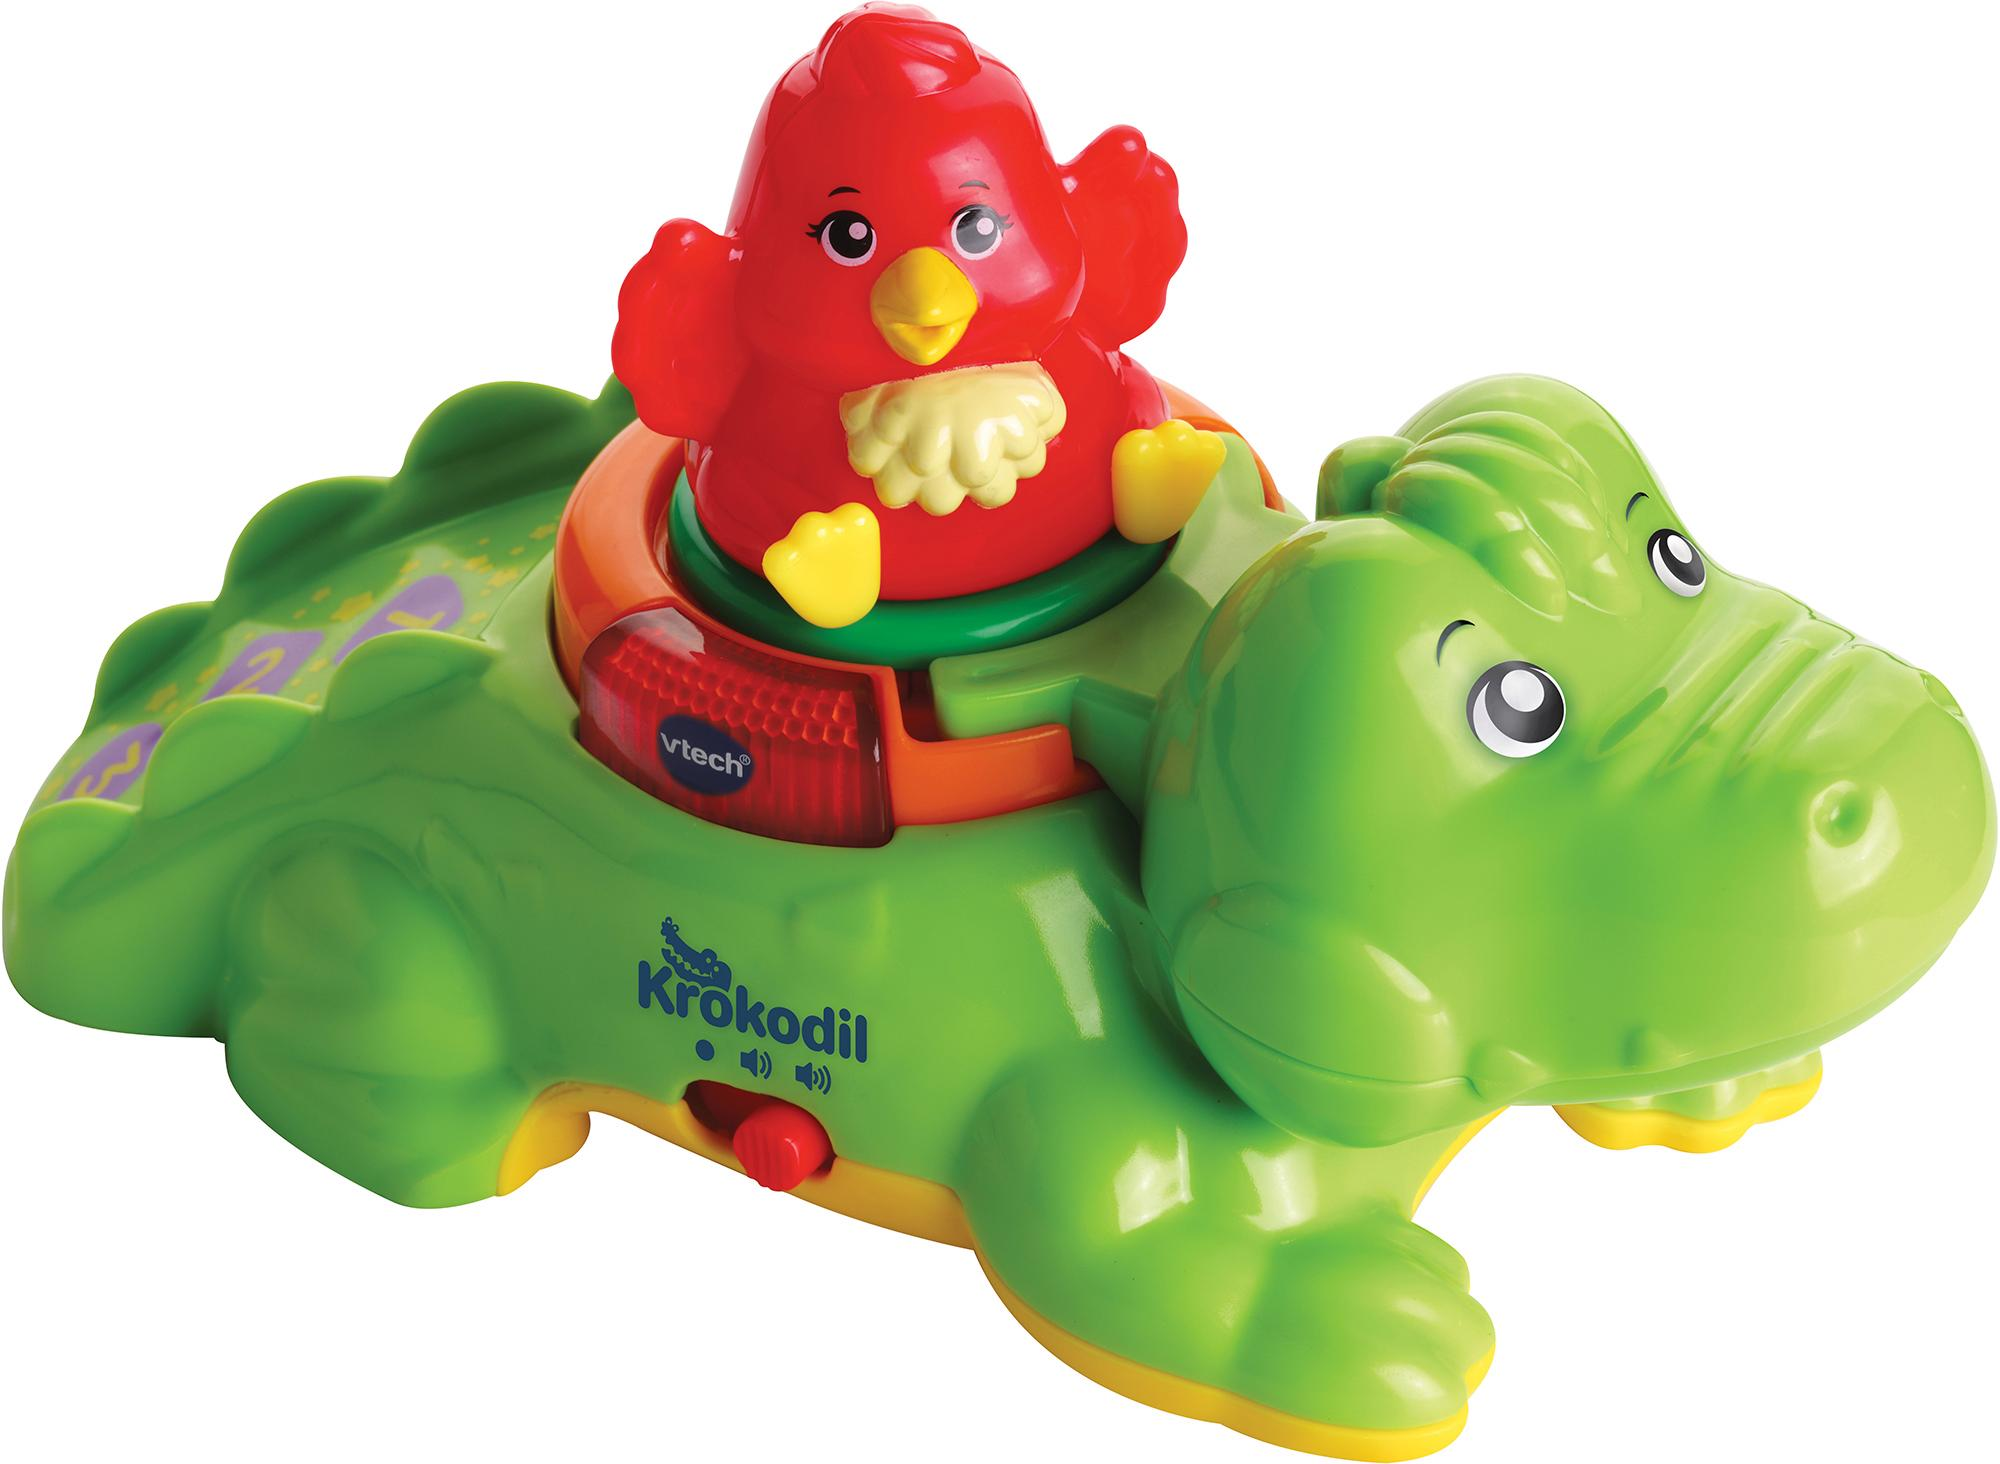 "Vtech Steckspielzeug ""ZoomiZooz - Huckepack-Krokodil"" Technik & Freizeit/Spielzeug/Baby & Kleinkind/Steck- & Stapelspielzeug"